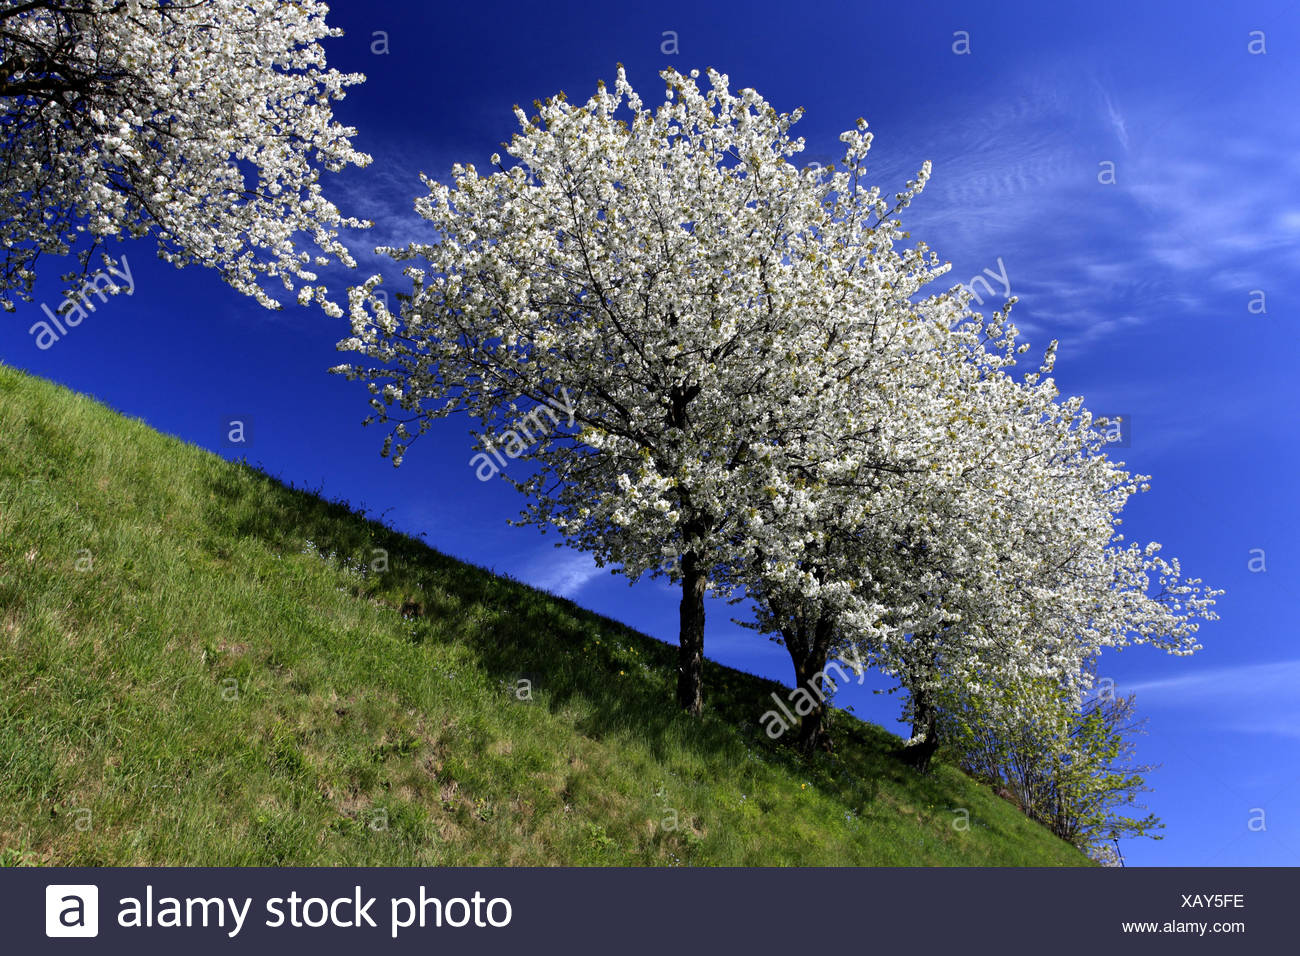 Italy, South Tirol, Hafling, fruit-tree, fruit blossom, - Stock Image